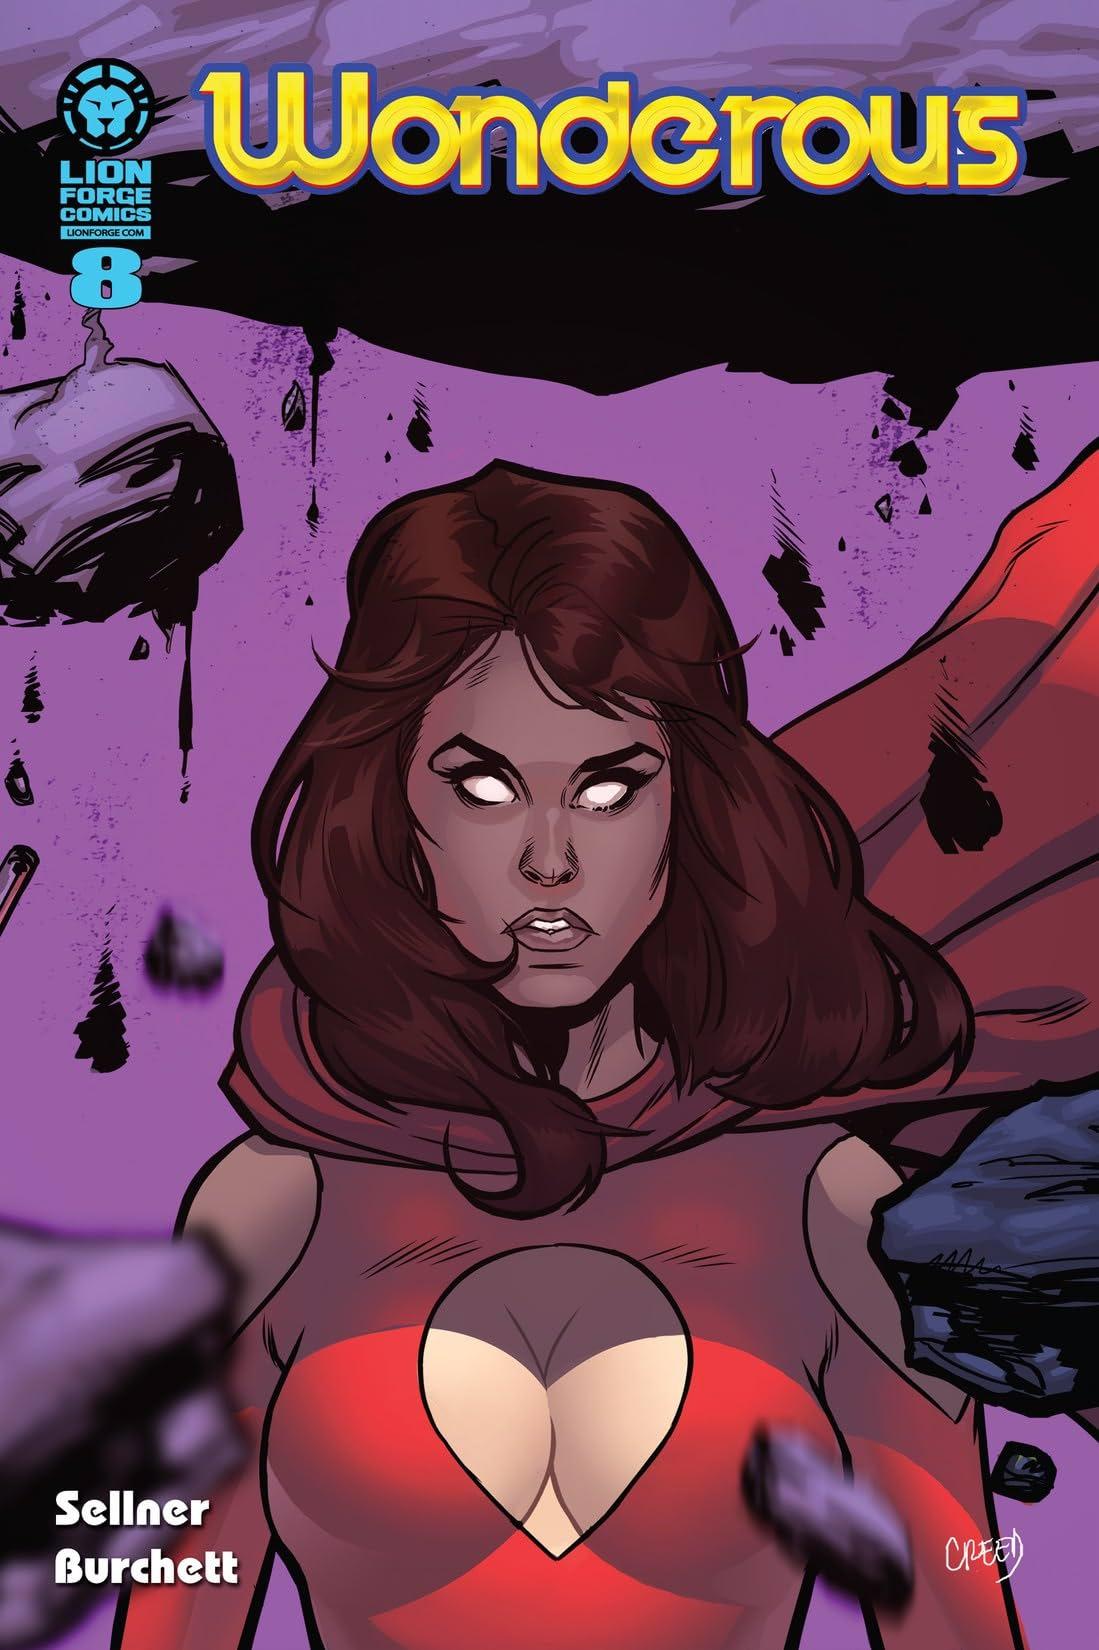 Wonderous: The Adventures of Claire Sinclair #8